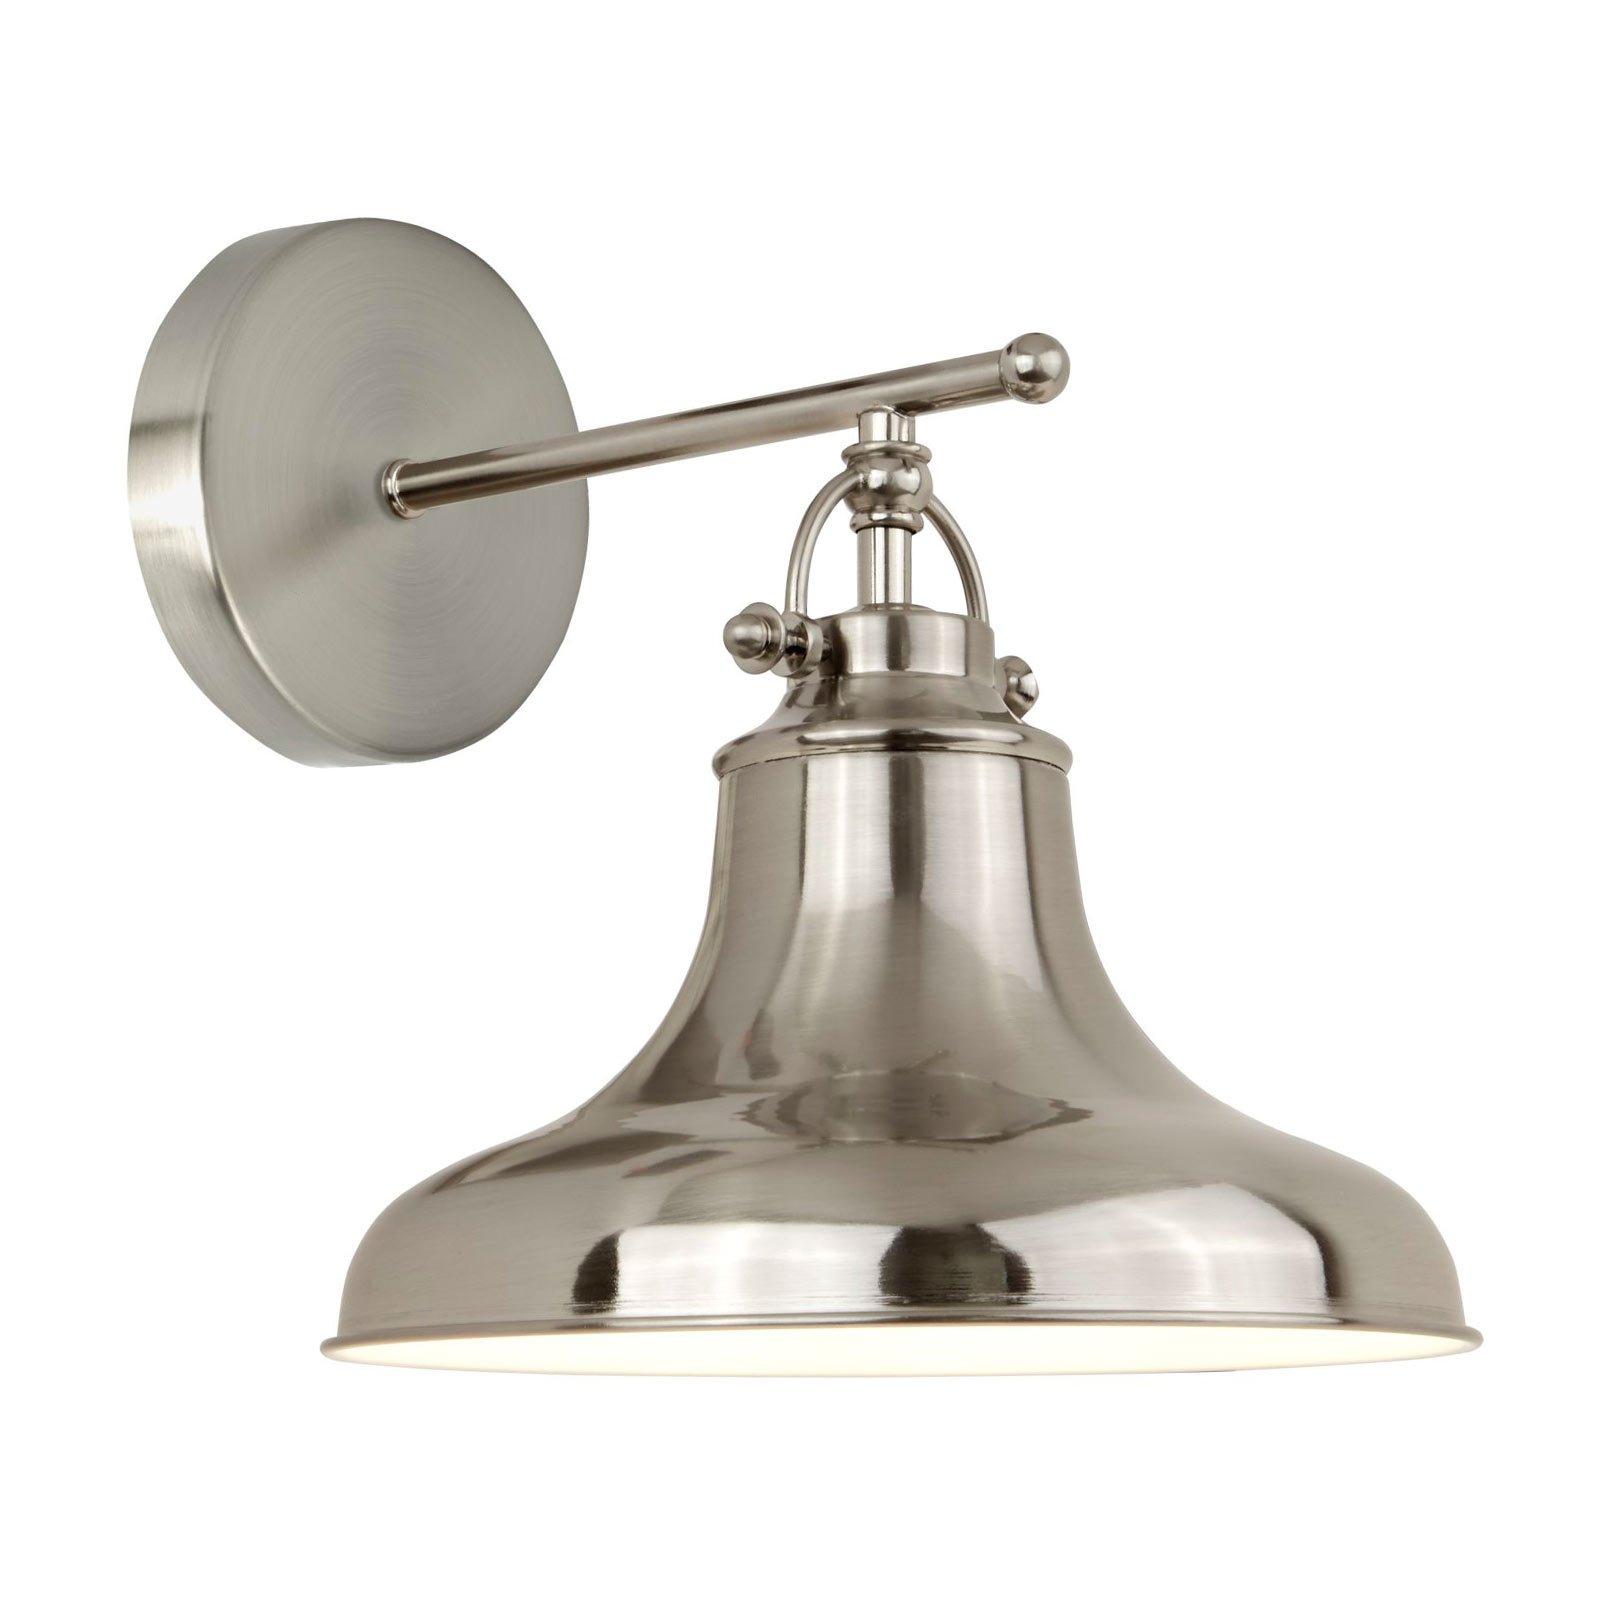 Vegglampe Dallas i industriell stil, sølv